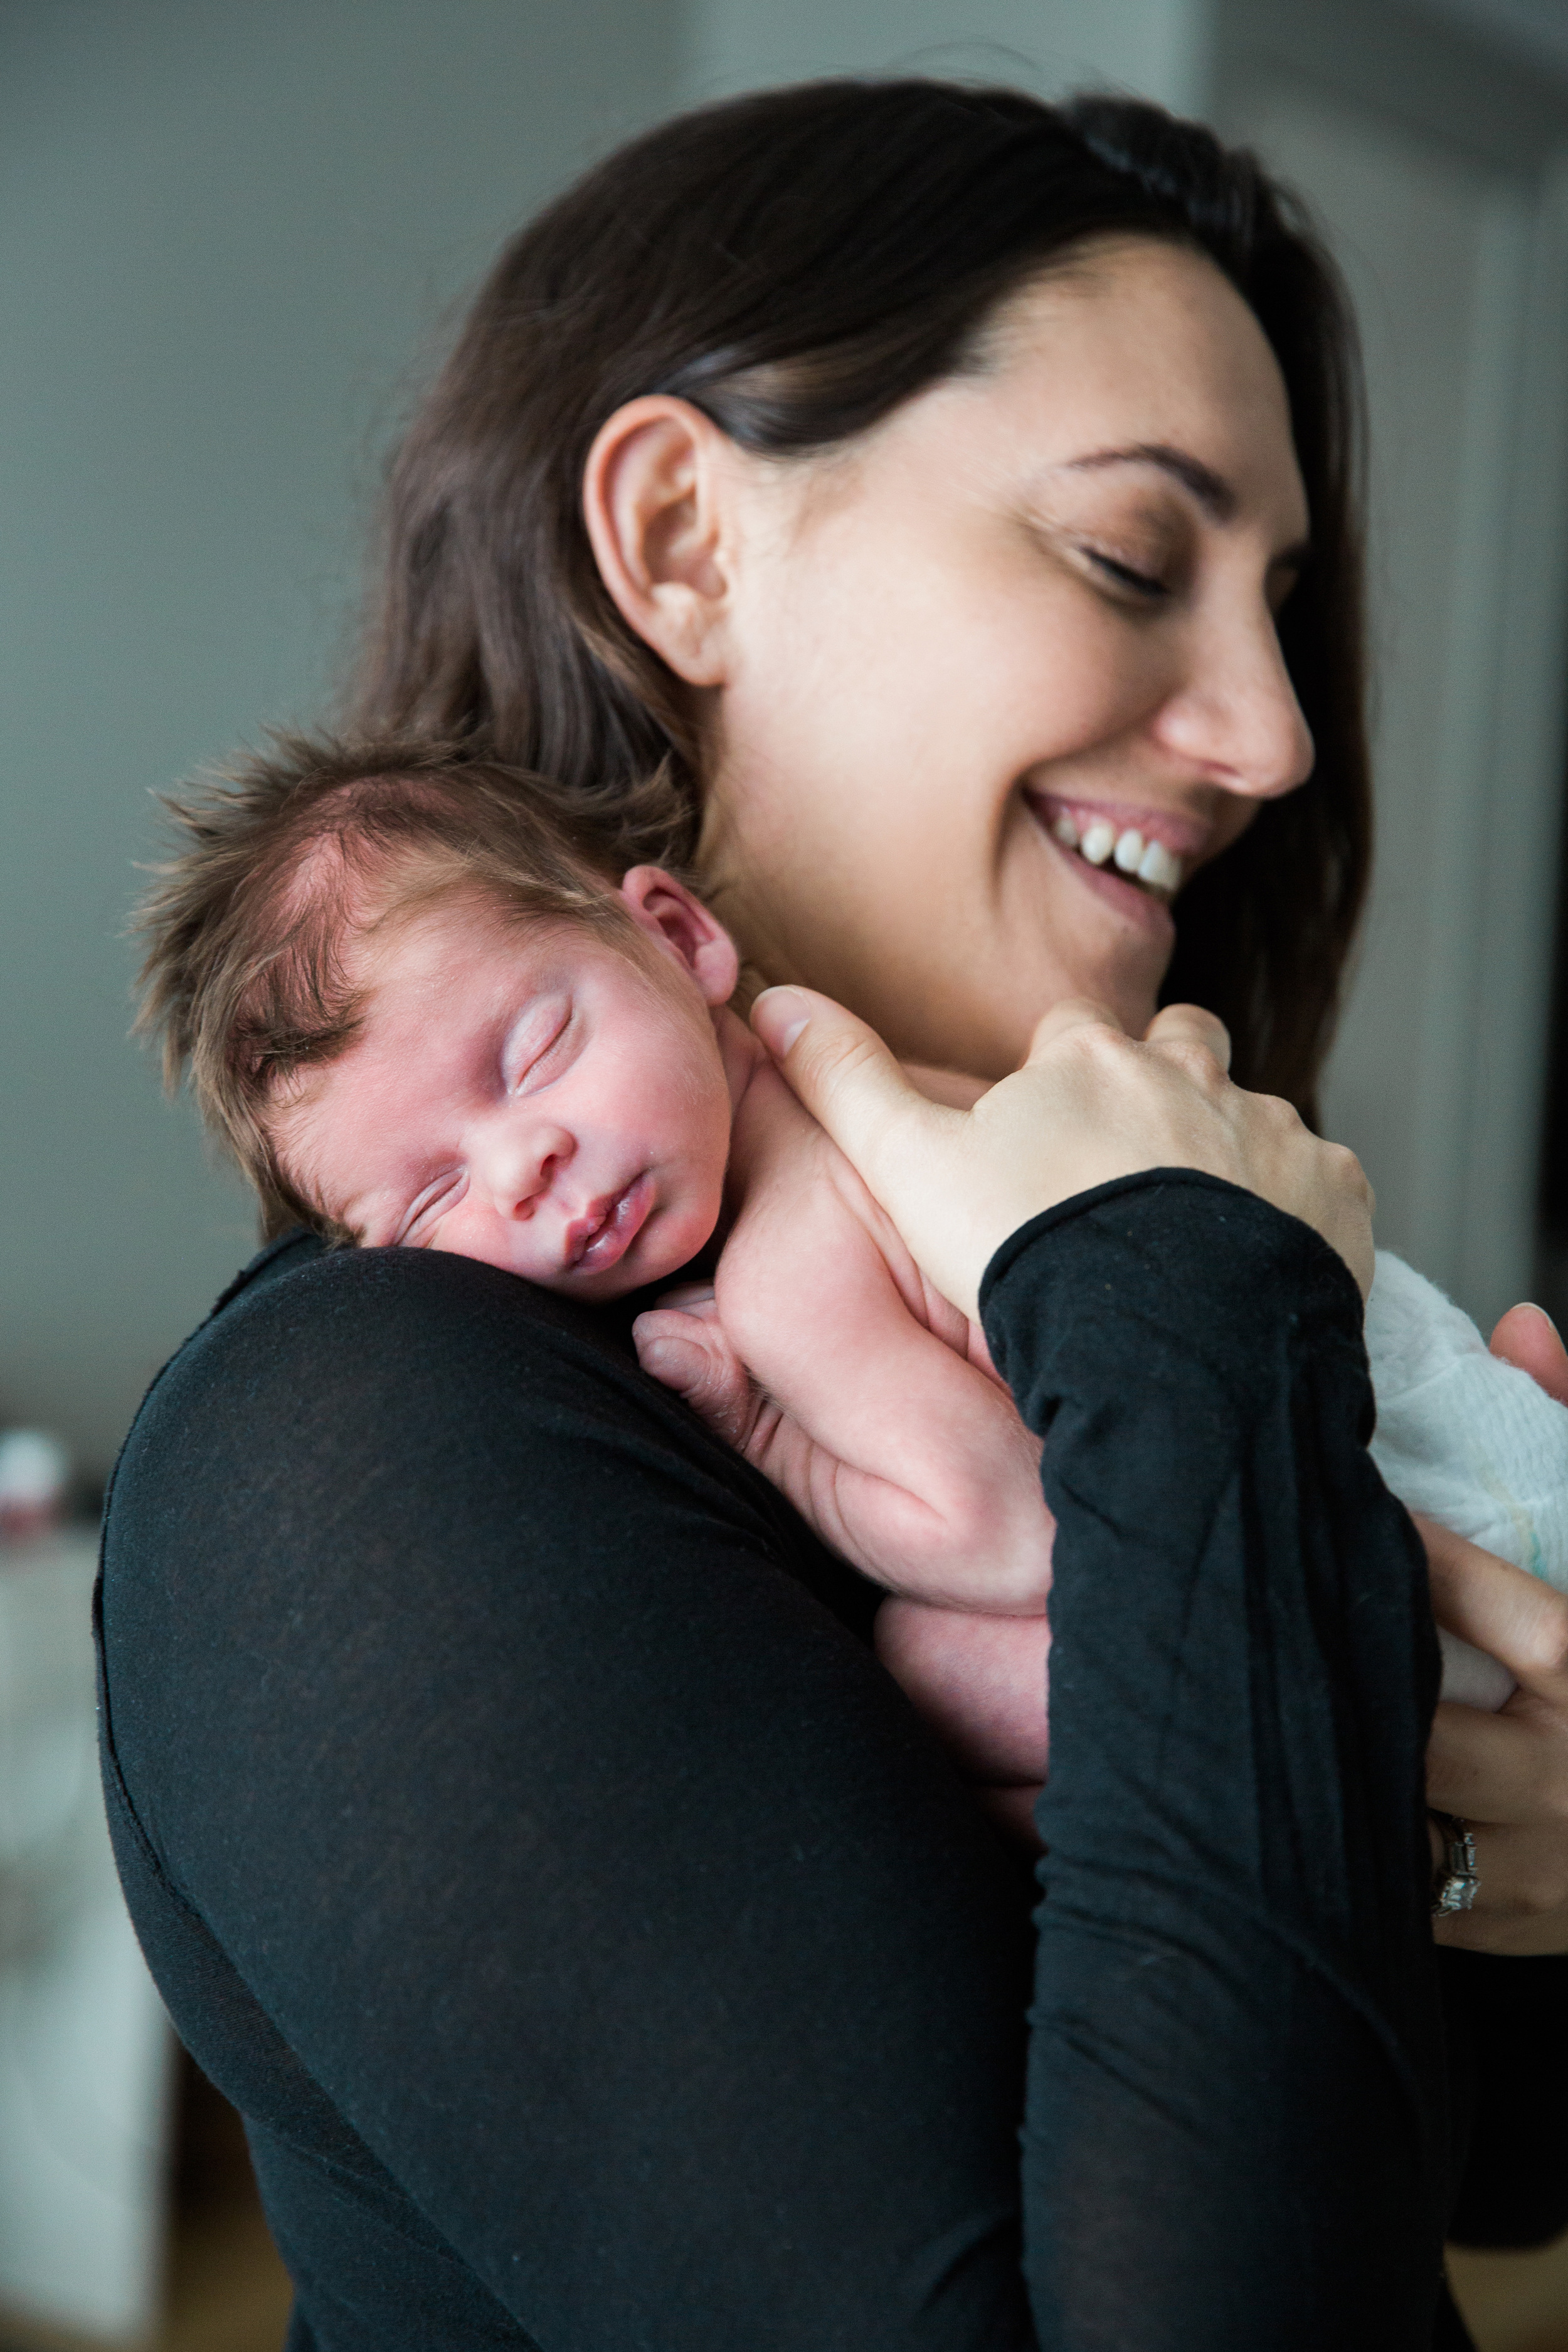 Clinton Hill Baby Kaden-4069-10.jpg